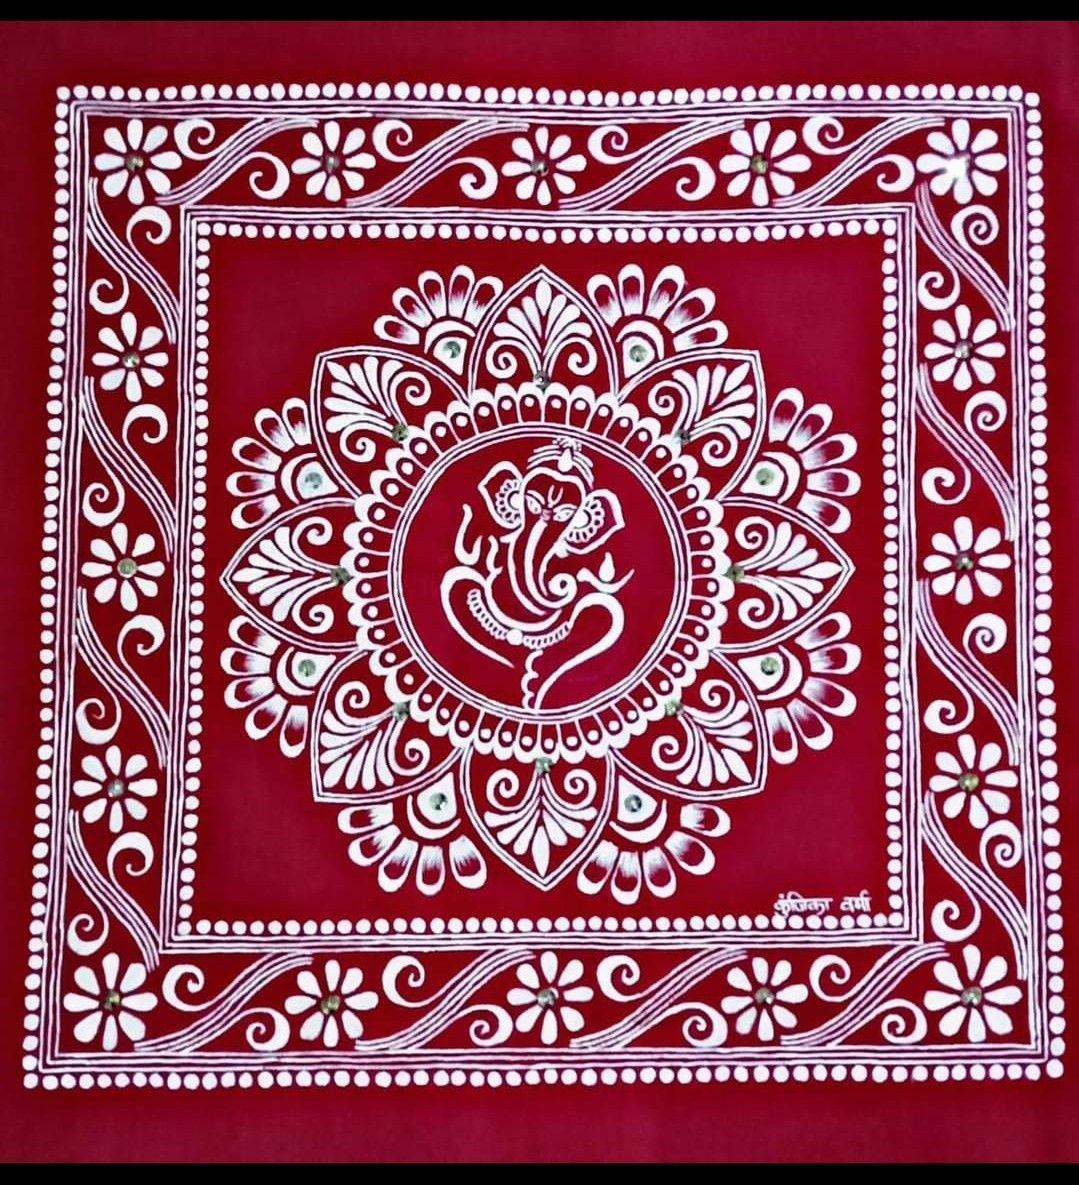 Aipan ganesha | Tribal art drawings, Canvas art projects, Indian art  paintings